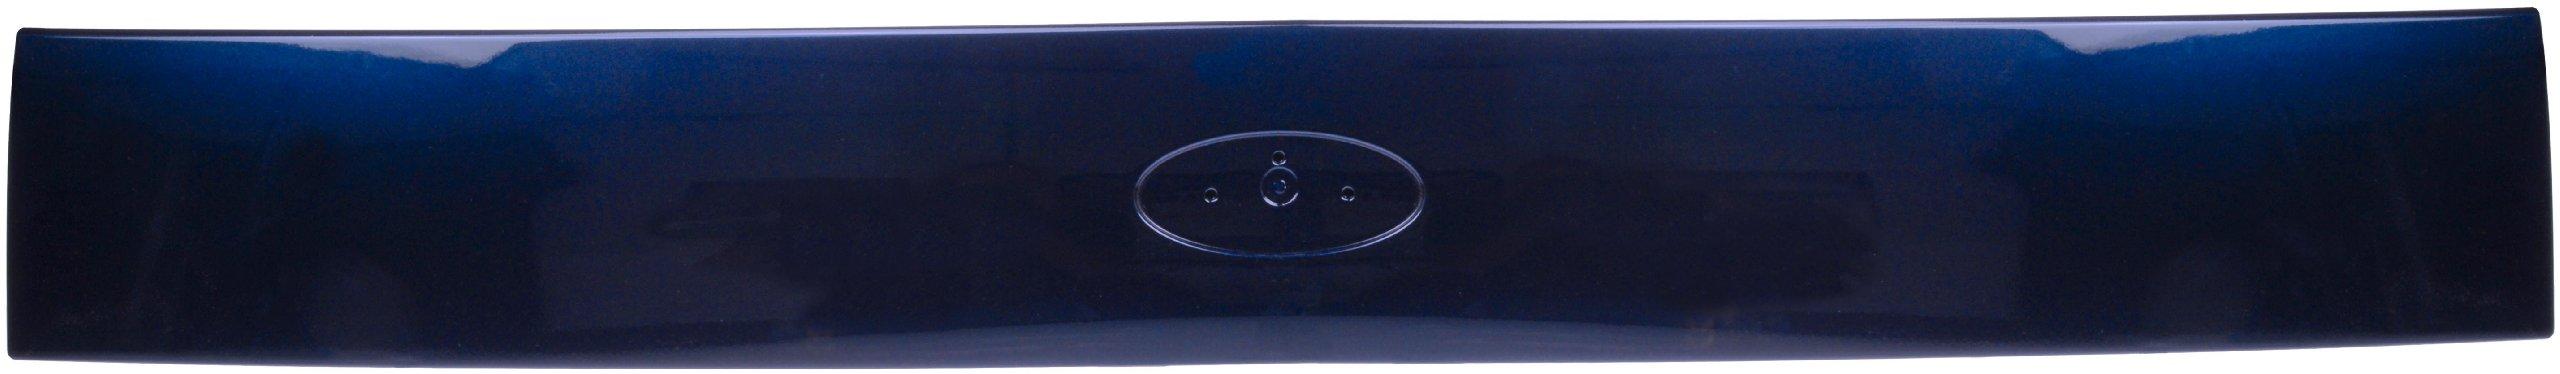 Dorman 924-096 Ford Rear True Blue Clear-Coated Hatch Panel